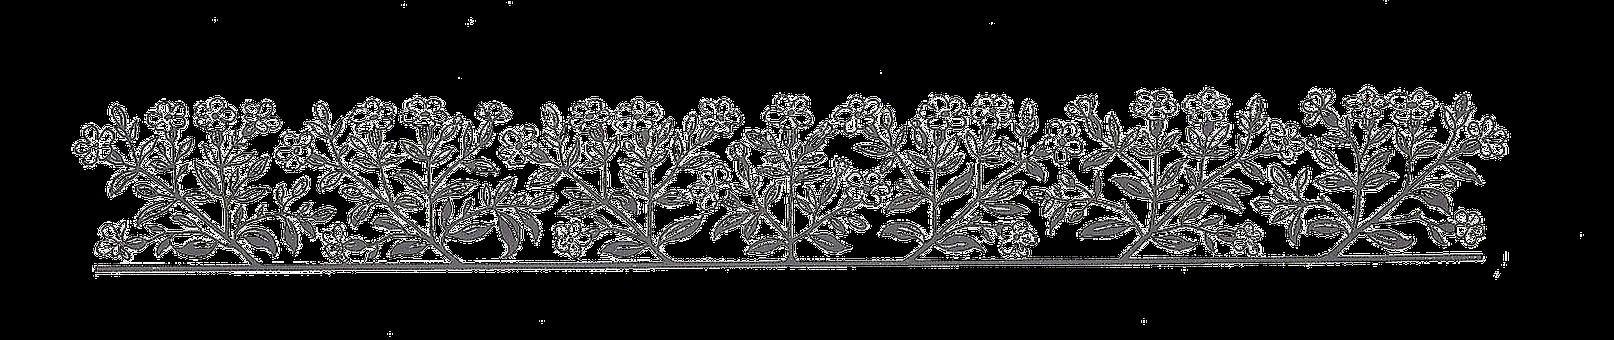 Floral, Ornamental Plant, Bloom, Silhouette, Cut